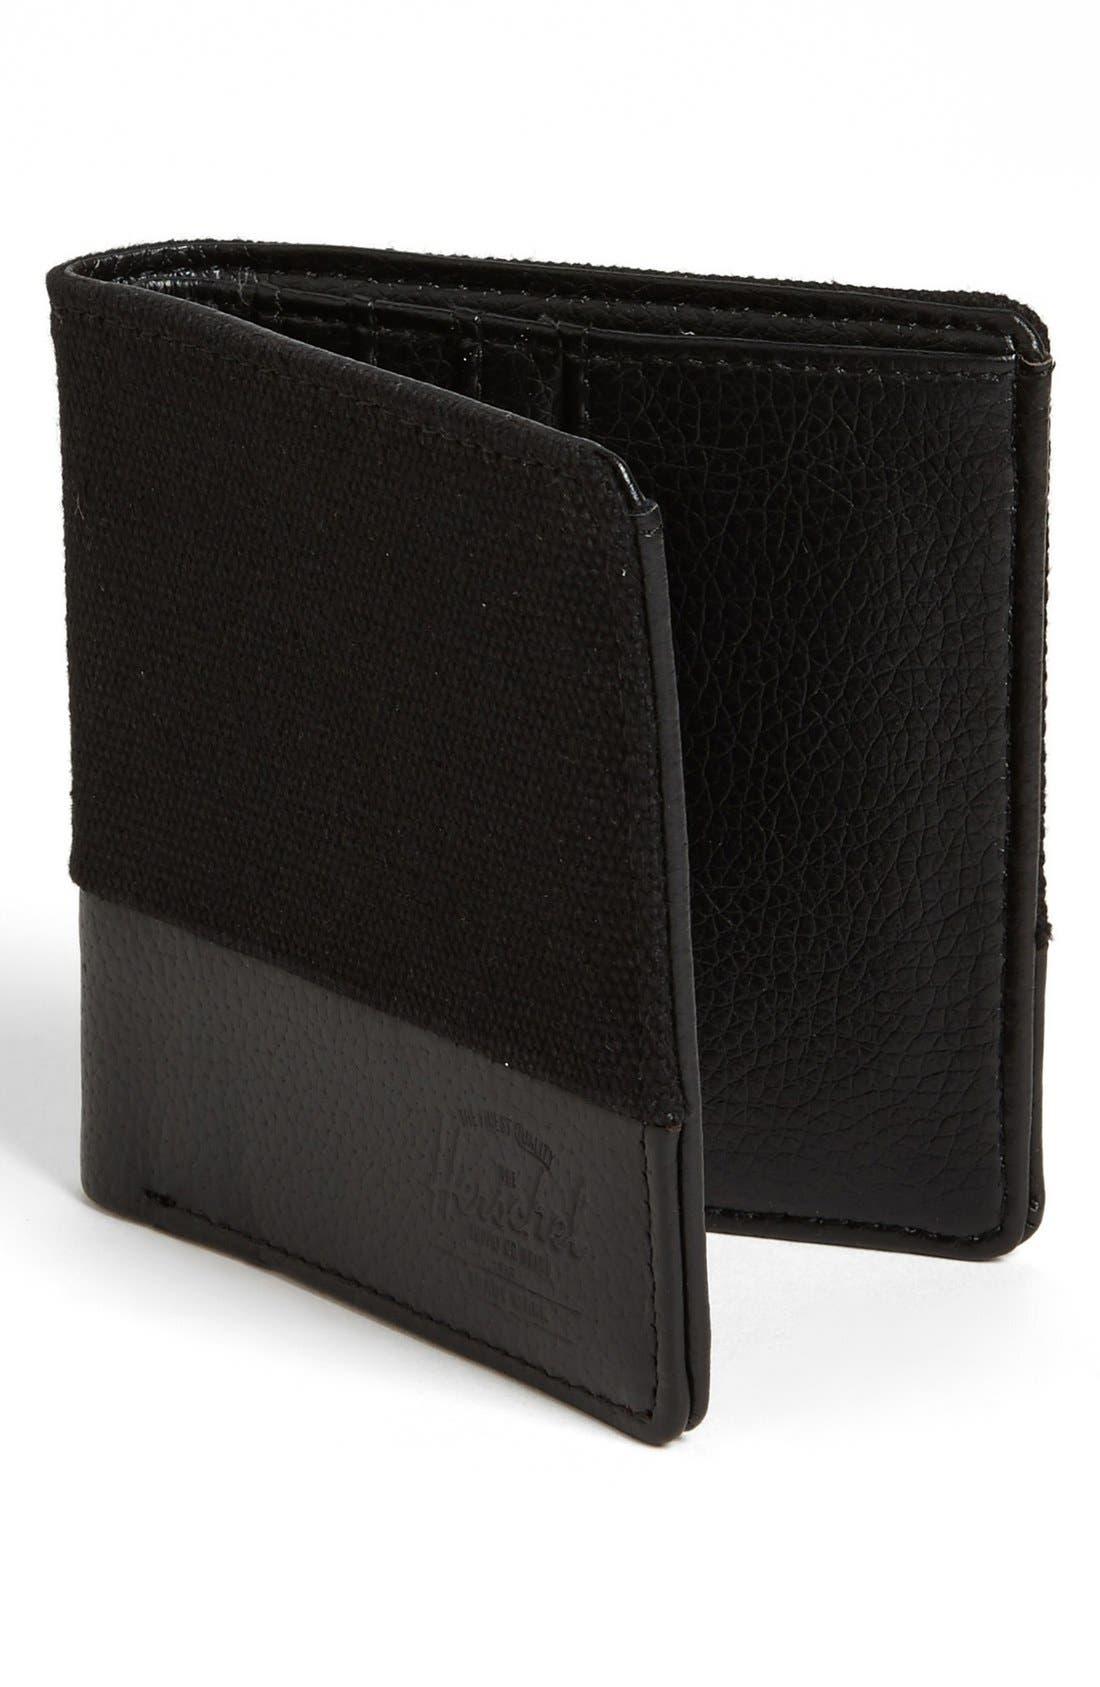 Main Image - Herschel Supply Co. 'Kenny' Wallet